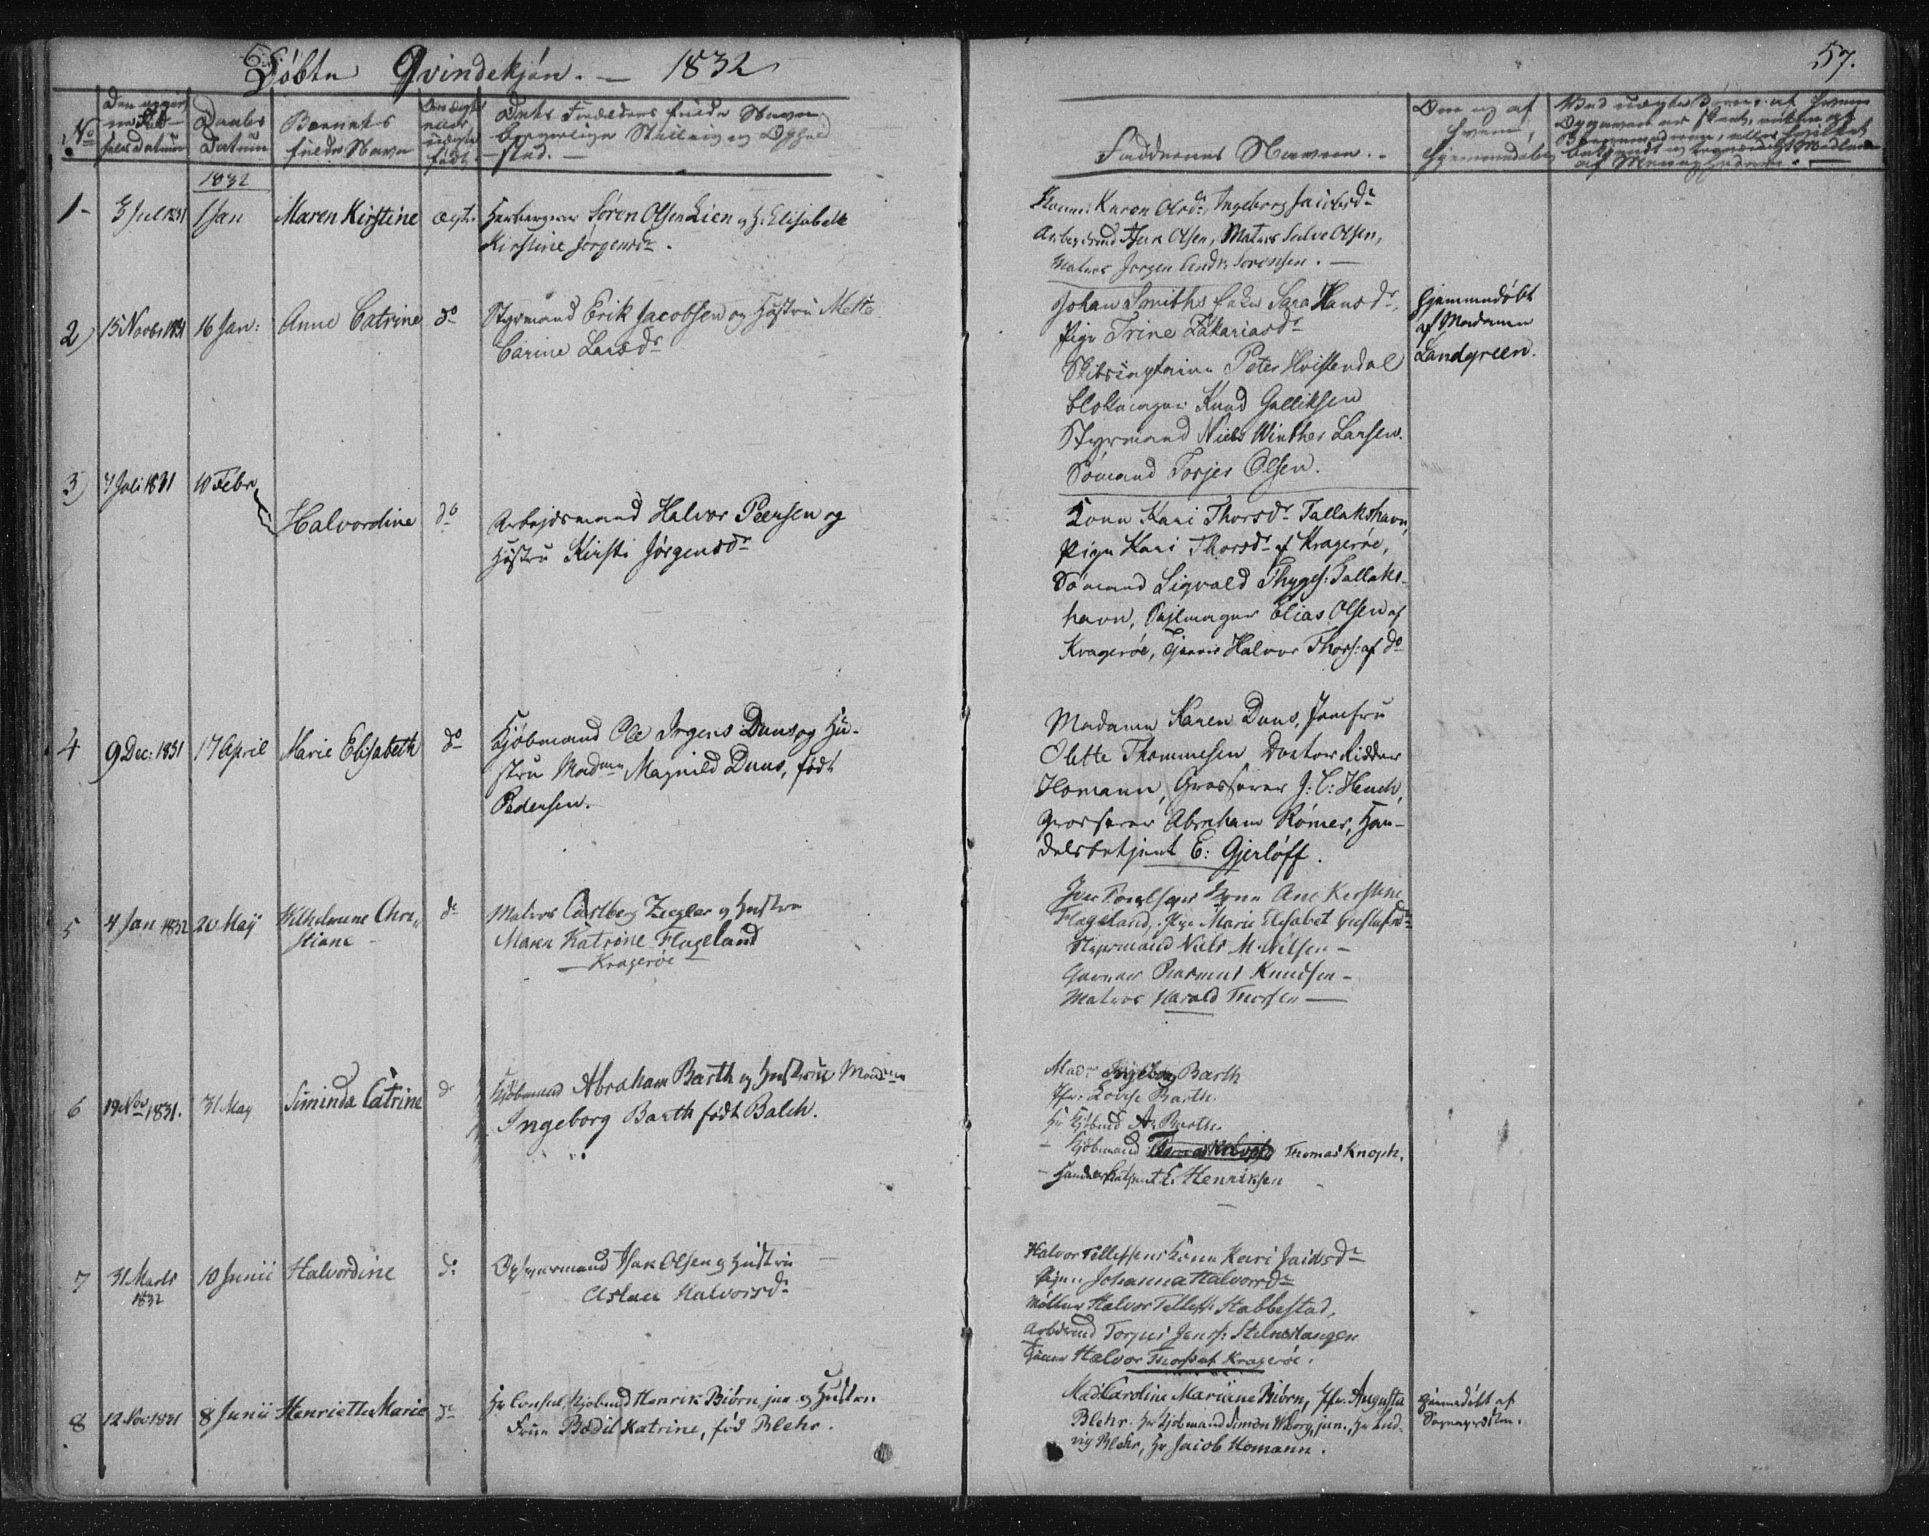 SAKO, Kragerø kirkebøker, F/Fa/L0005: Ministerialbok nr. 5, 1832-1847, s. 57